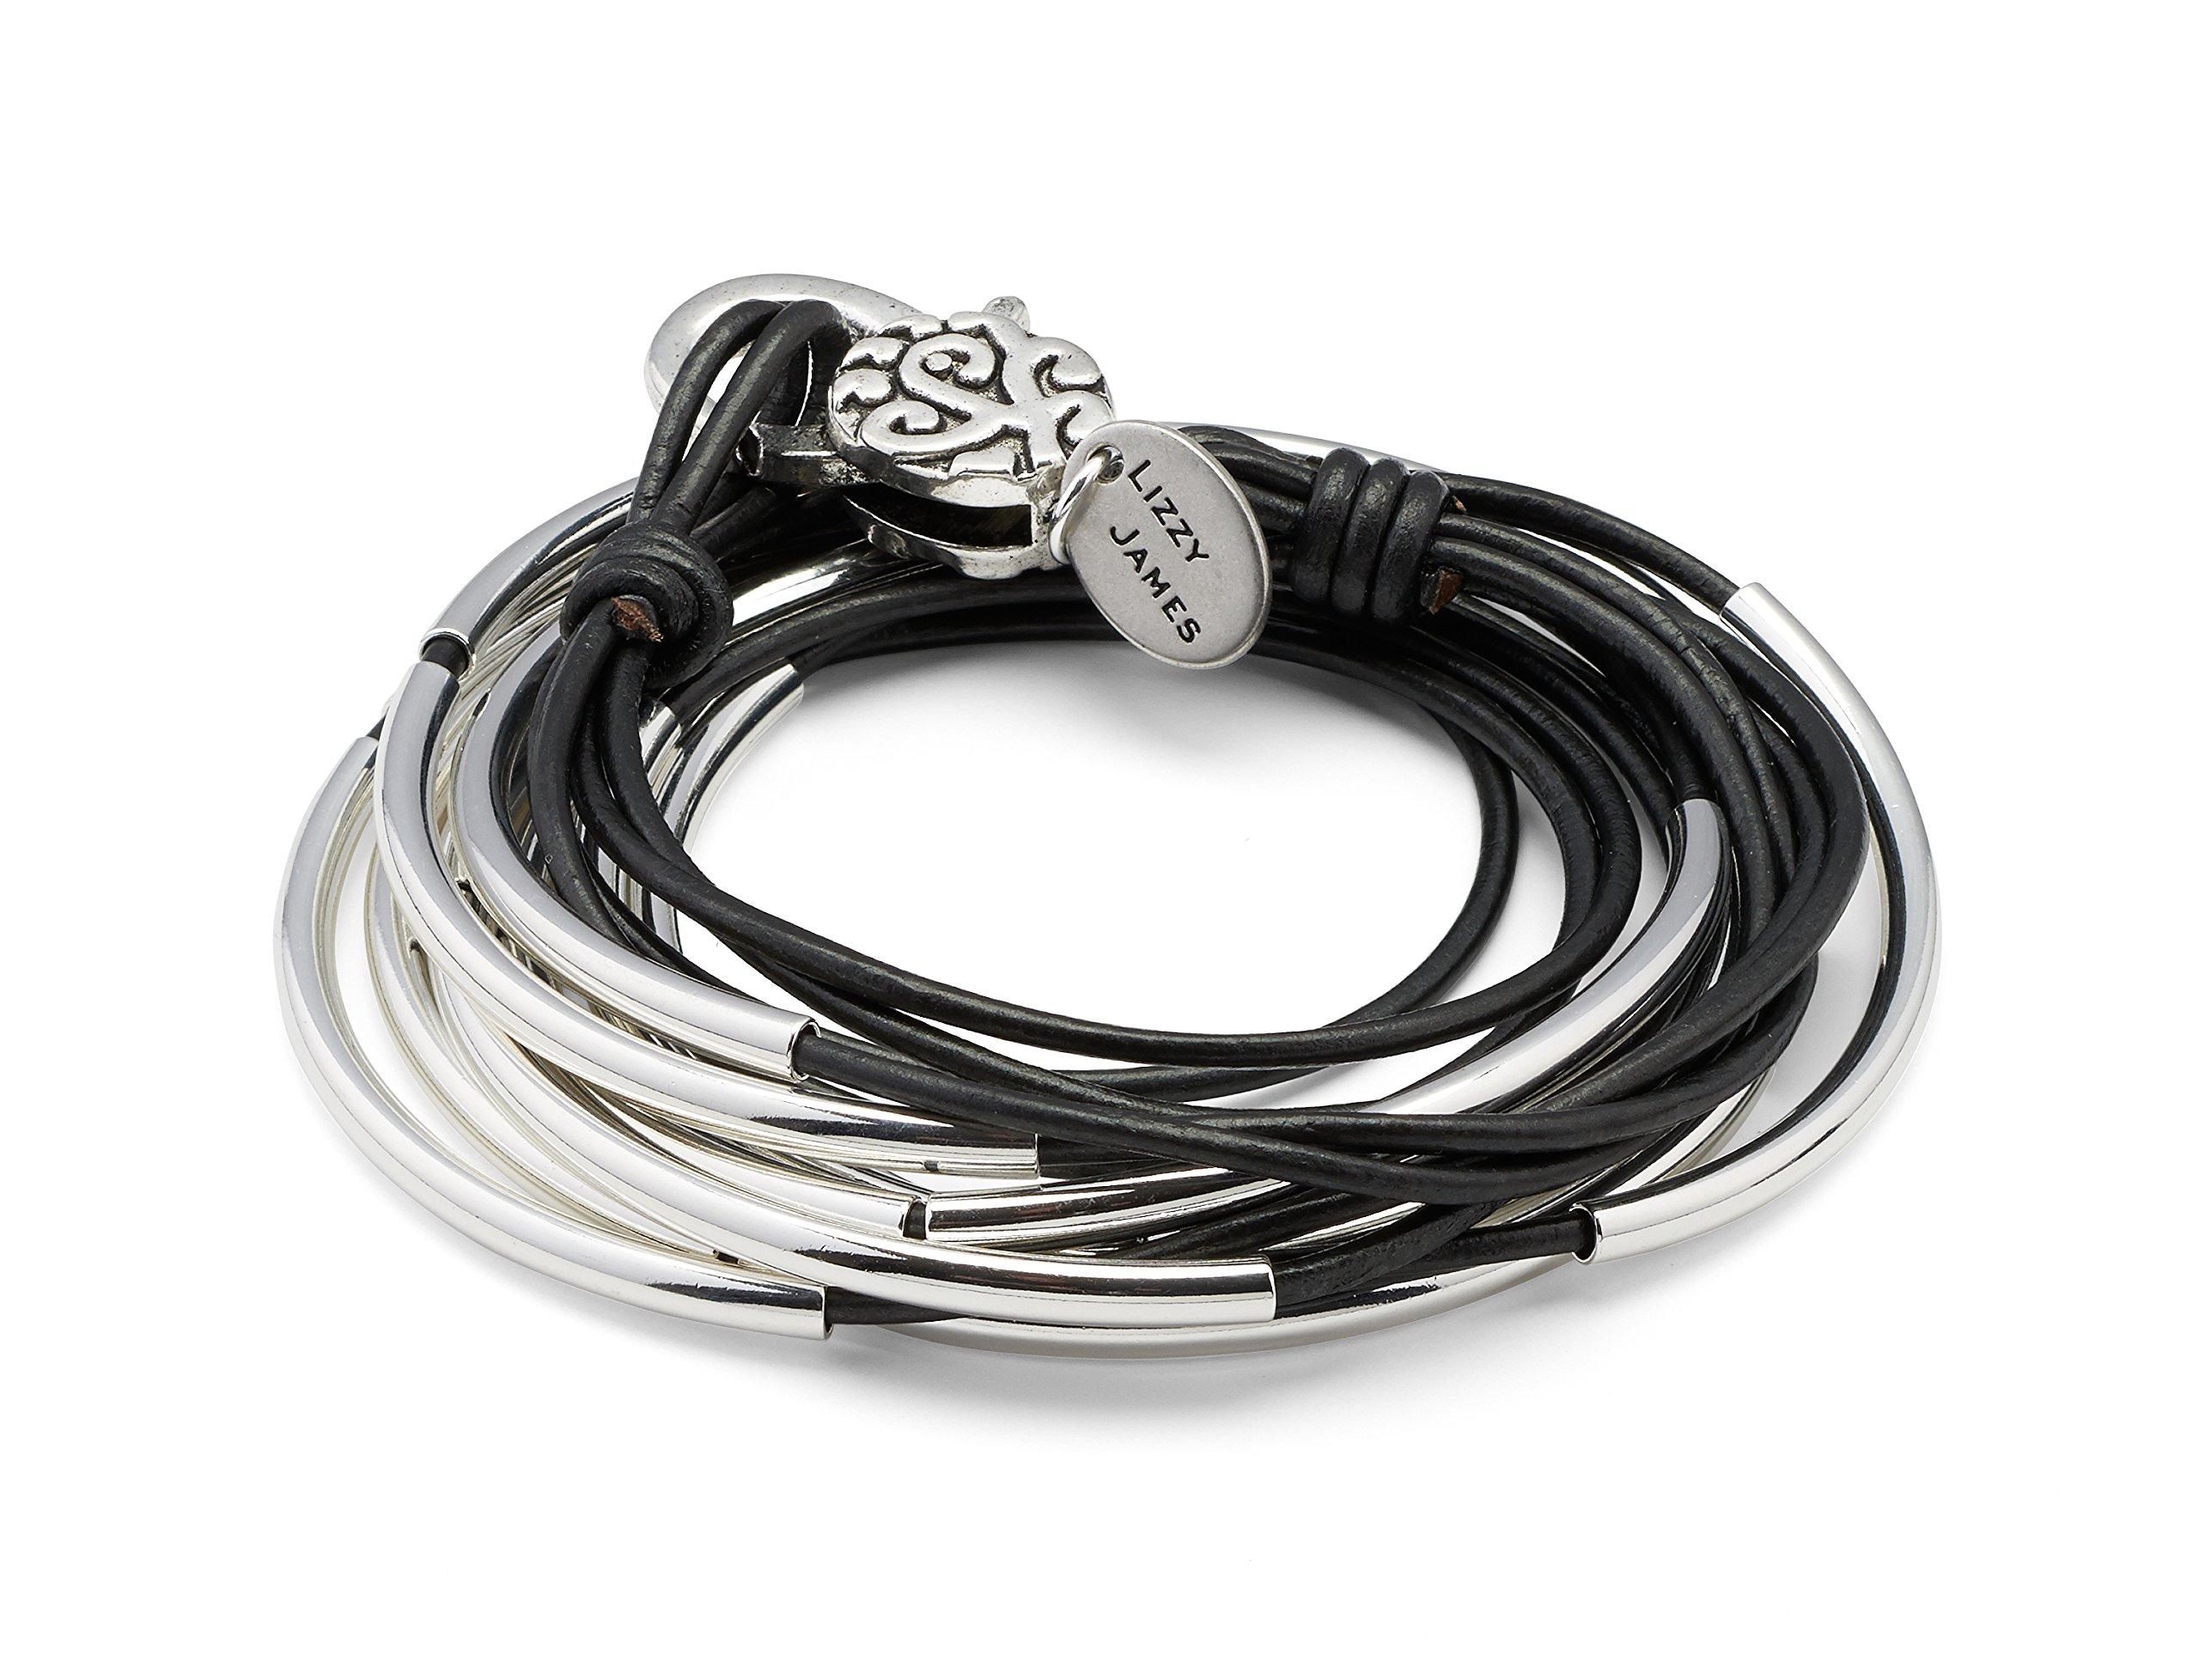 Lizzy Classic Silverplated 4 Strand Metallic Gunmetal Leather Wrap Bracelet (Large (6 5/8'' - 7''))